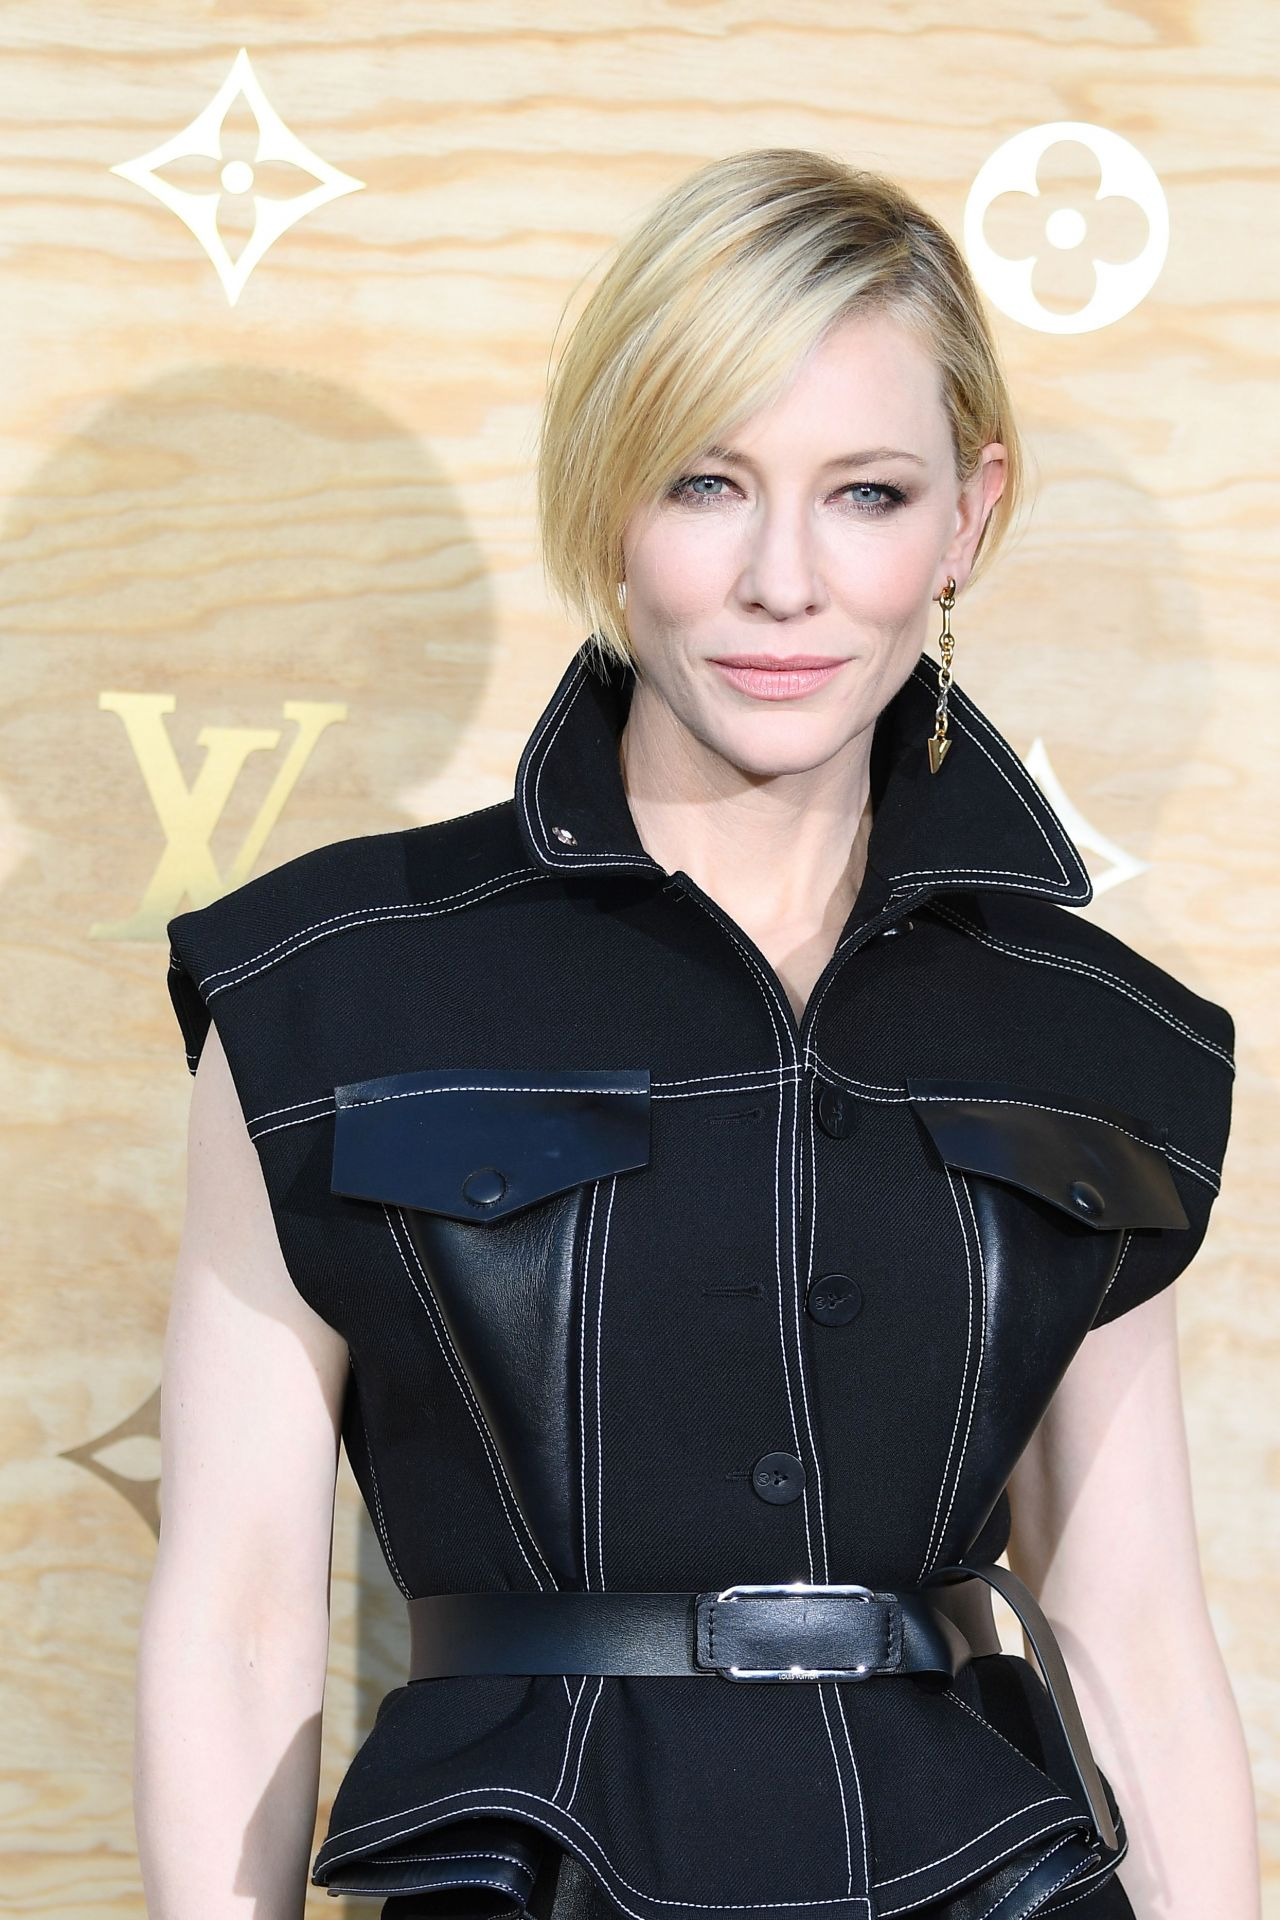 Cate Blanchett Latest Photos - CelebMafia Cate Blanchett